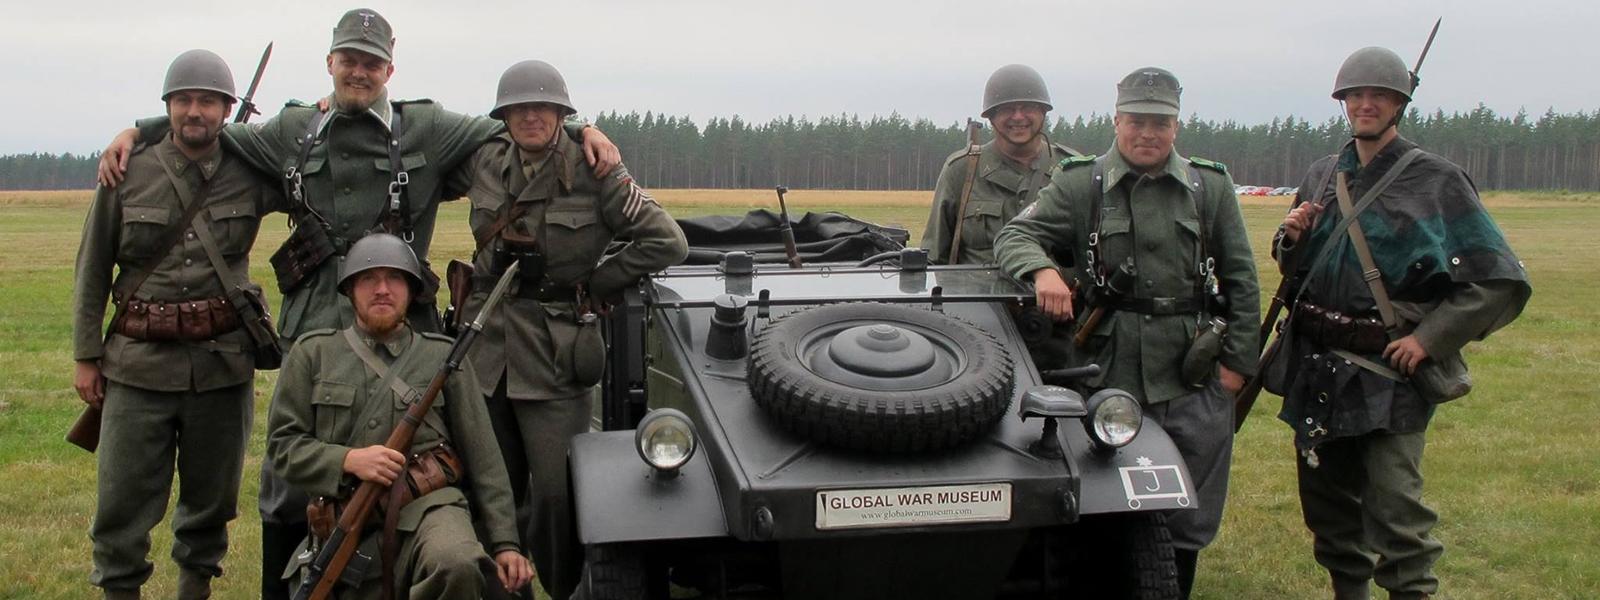 Välkommen till Global War Museum i Munkedal